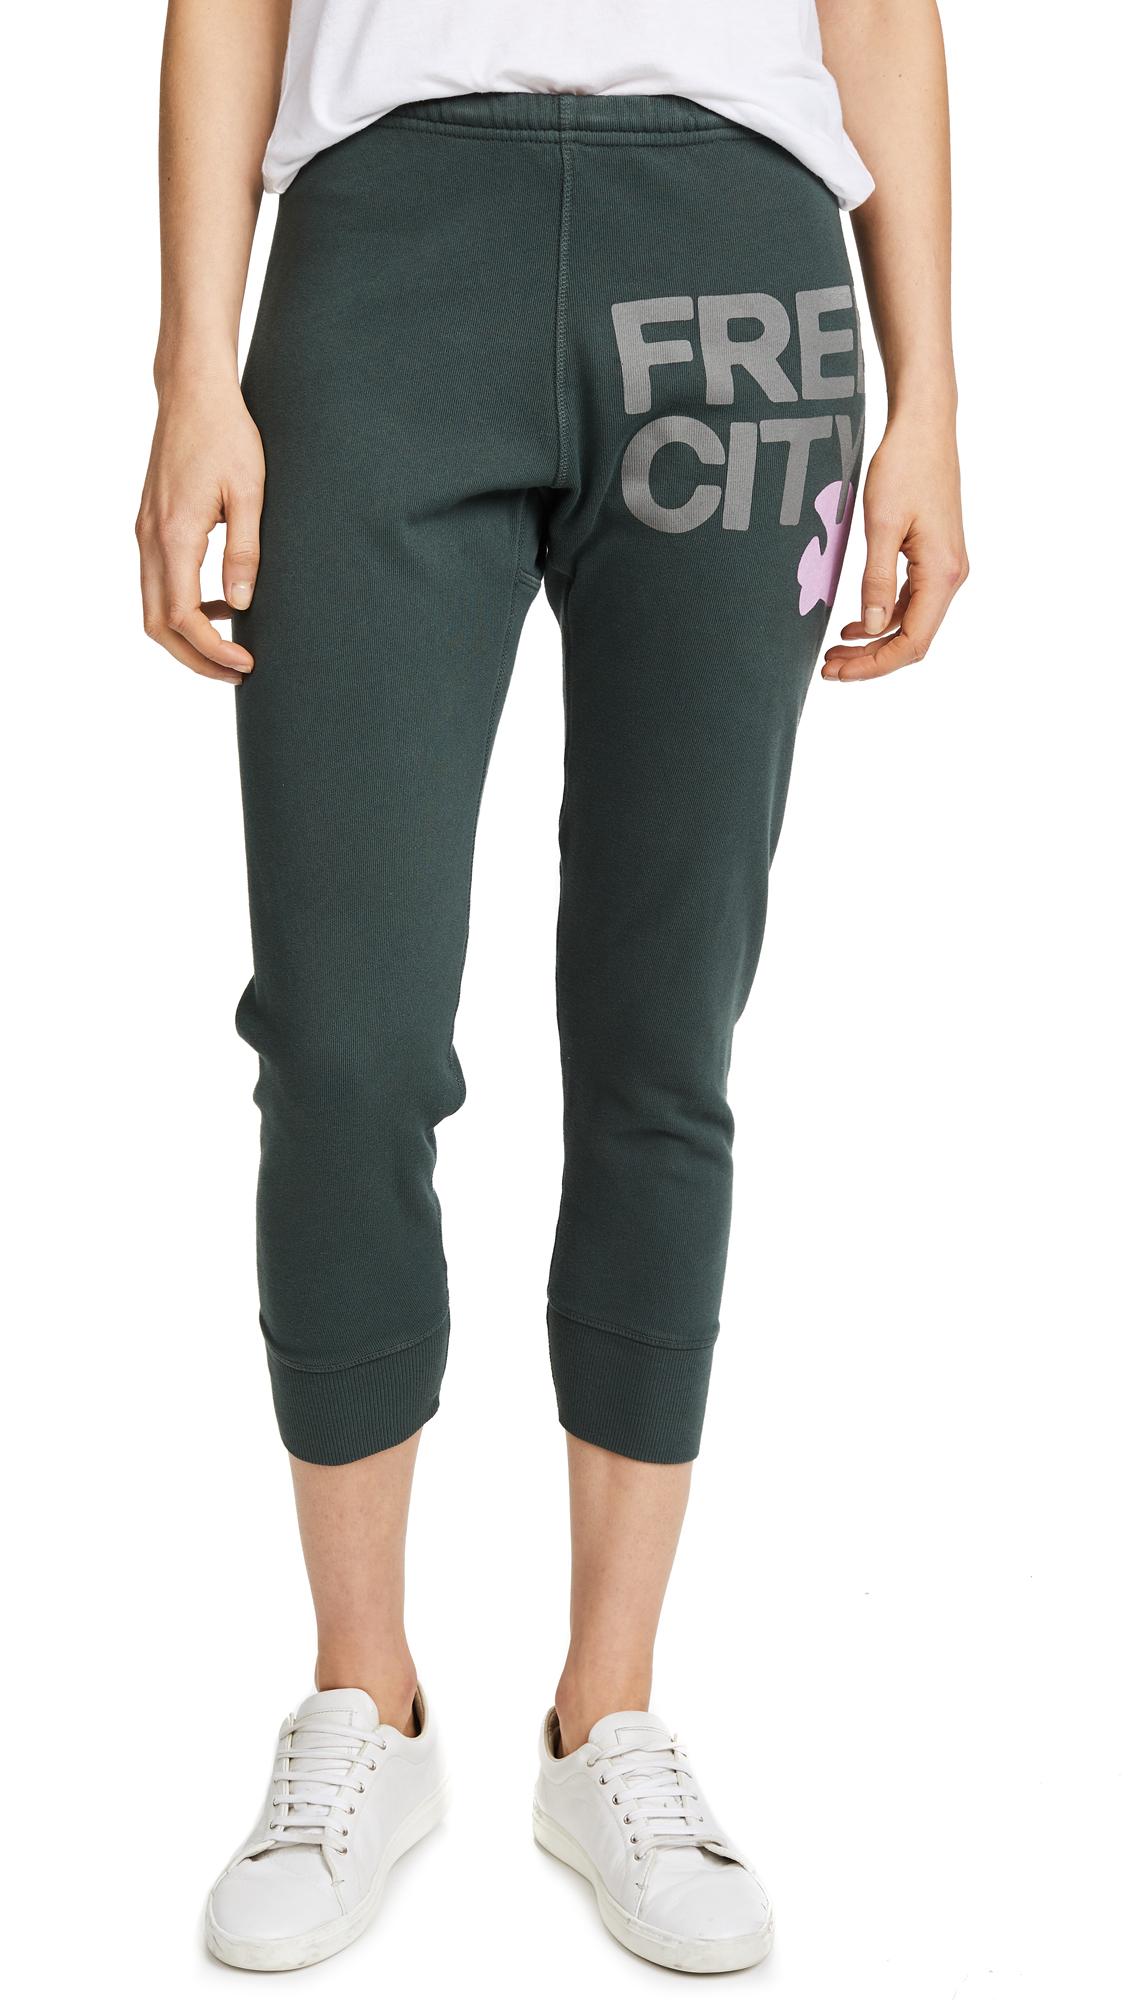 Freecity 3/4 Sweatpants